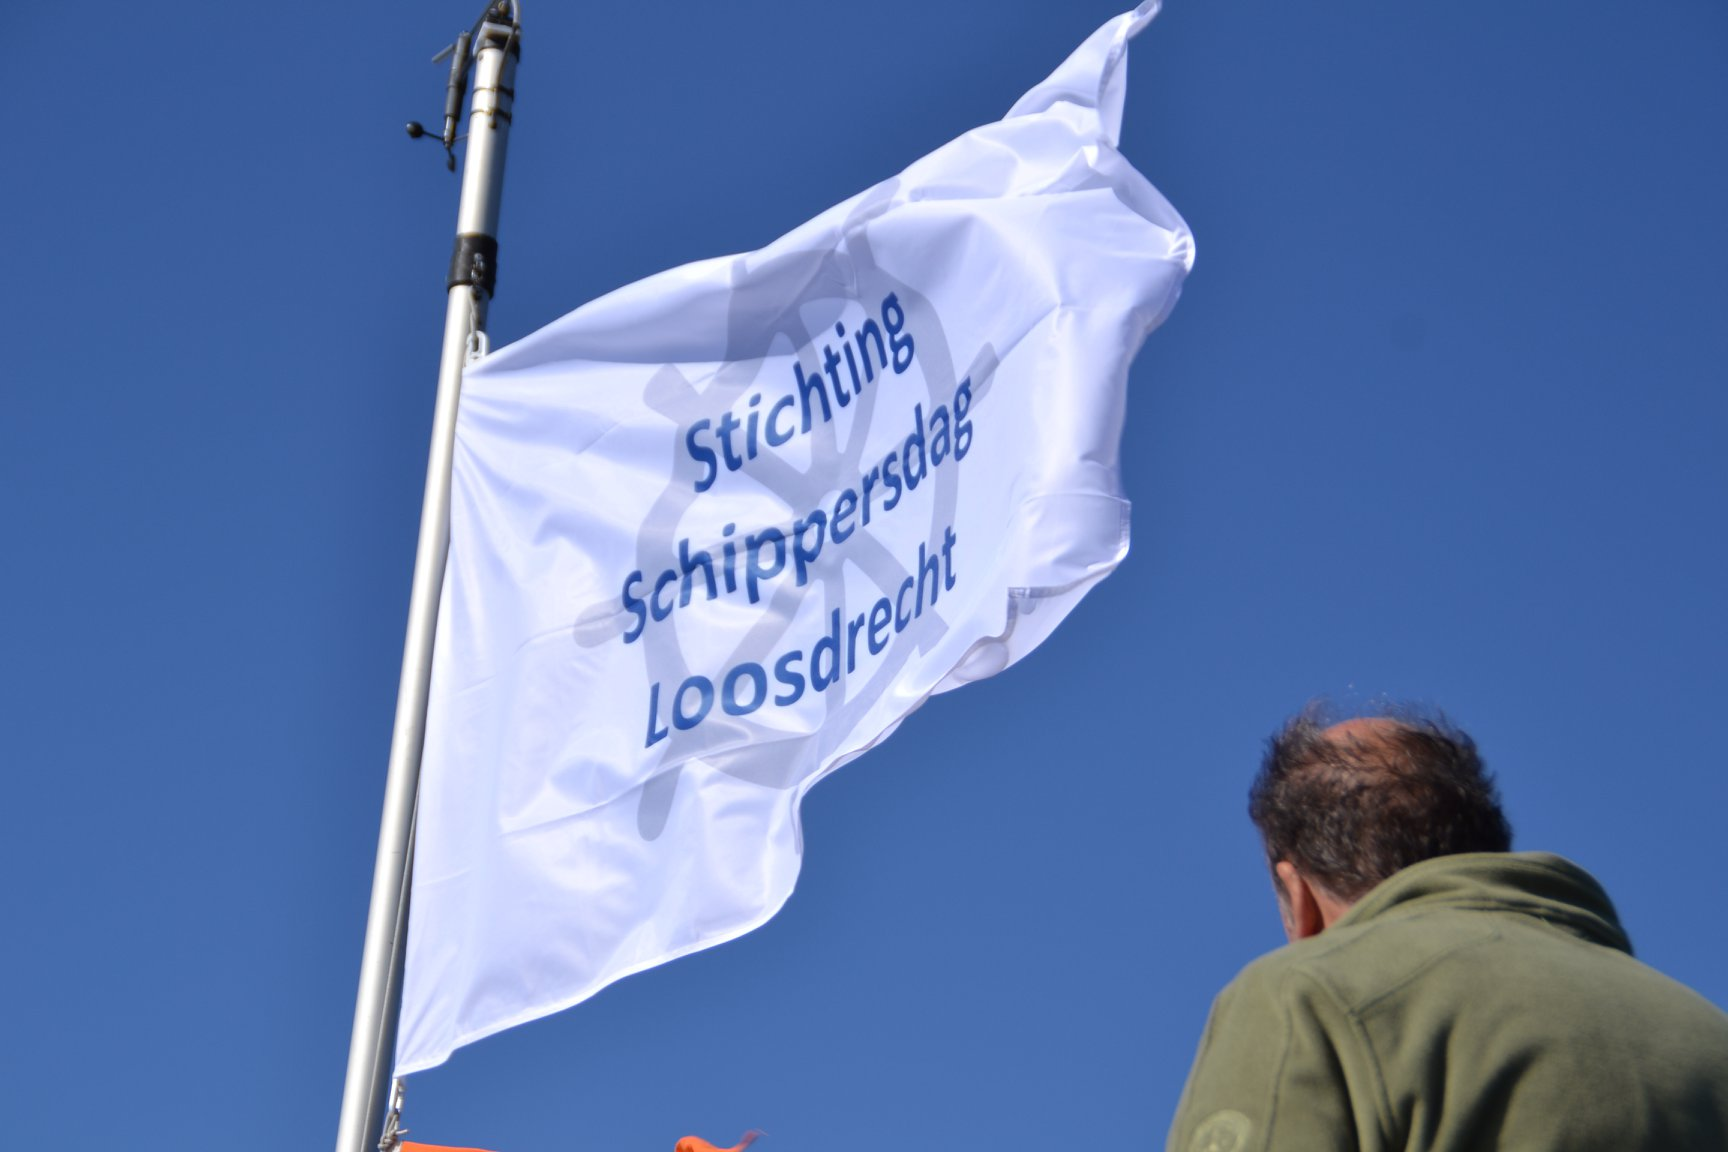 vlag schippersdag loosdrecht